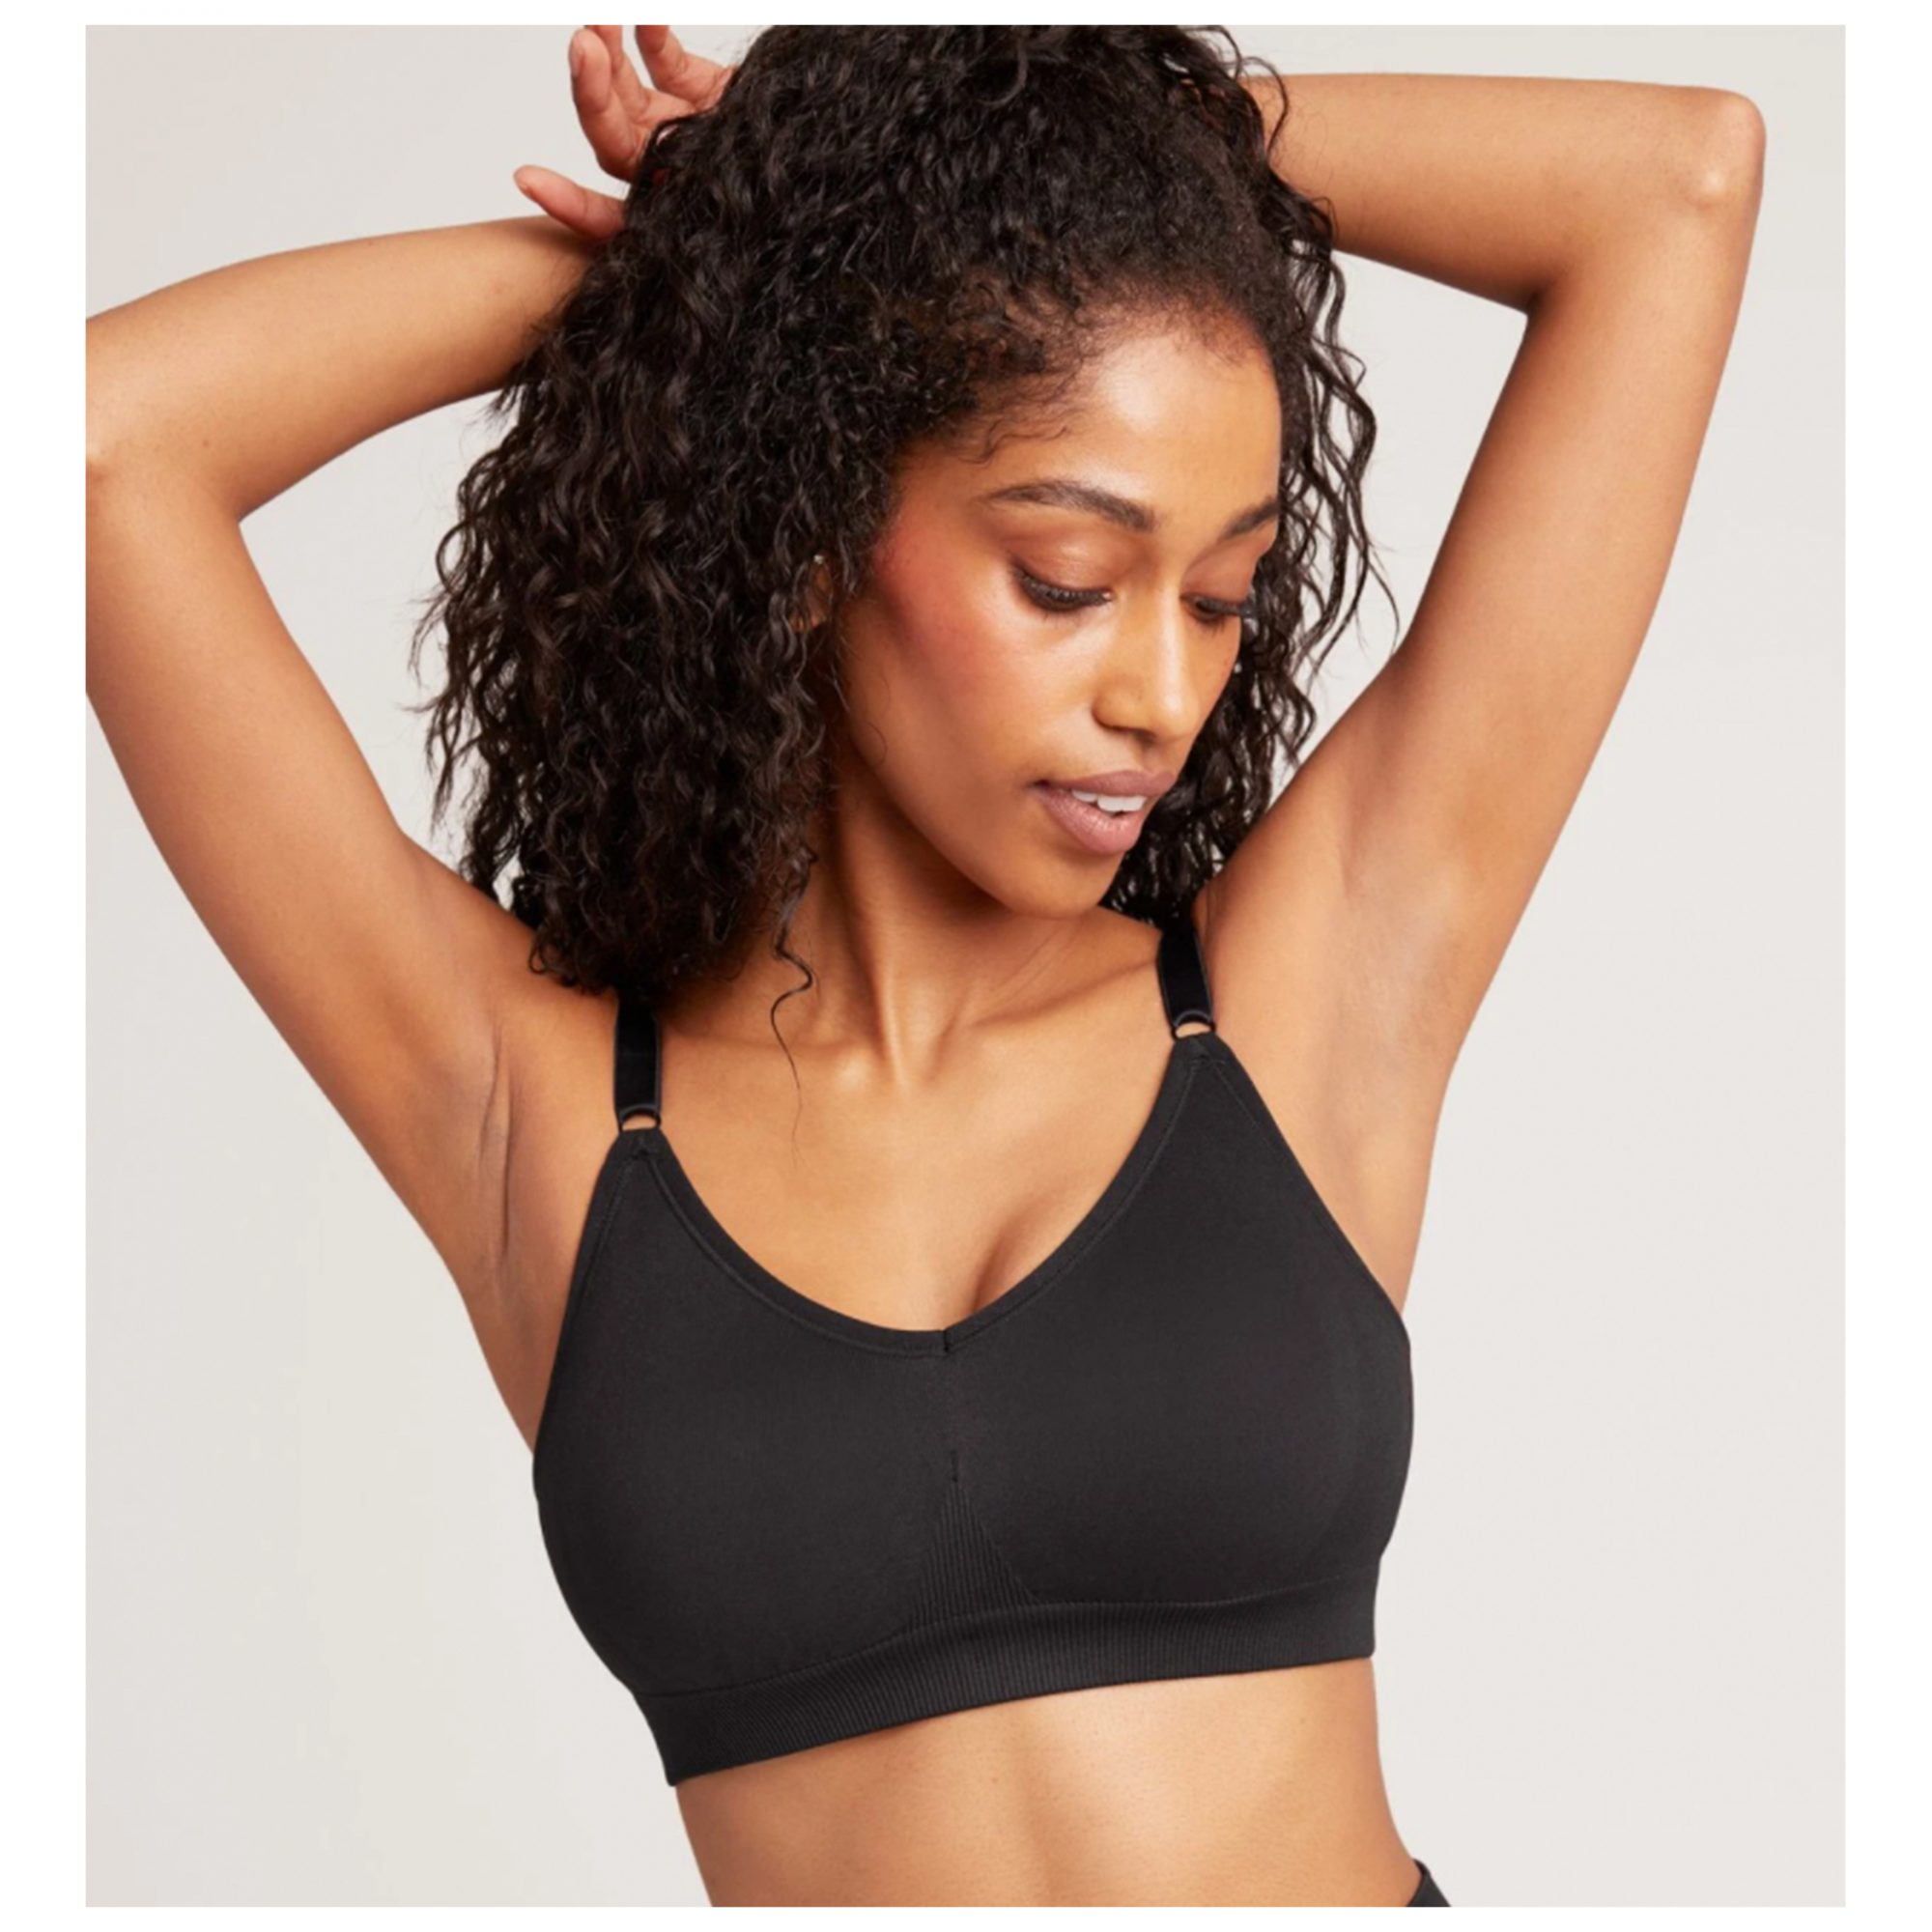 best-wireless-sports-bra-big-boobs